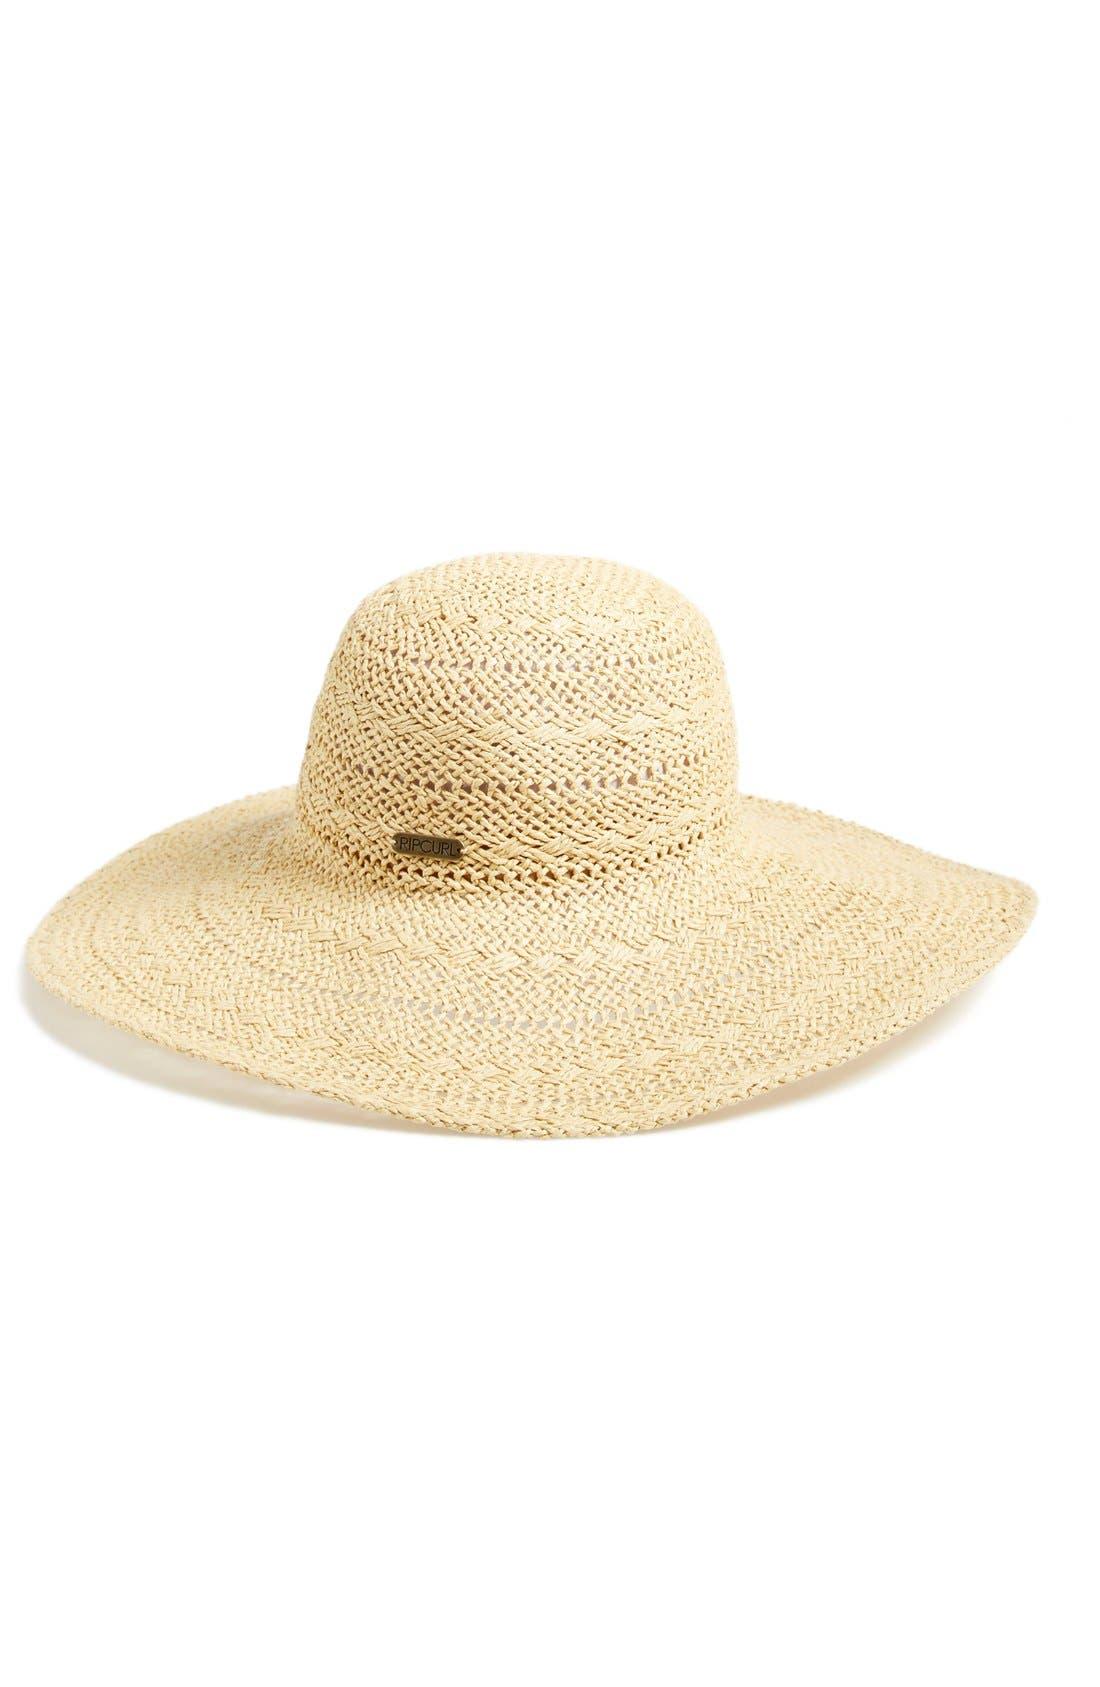 Main Image - Rip Curl 'Dusty' Boho Straw Hat